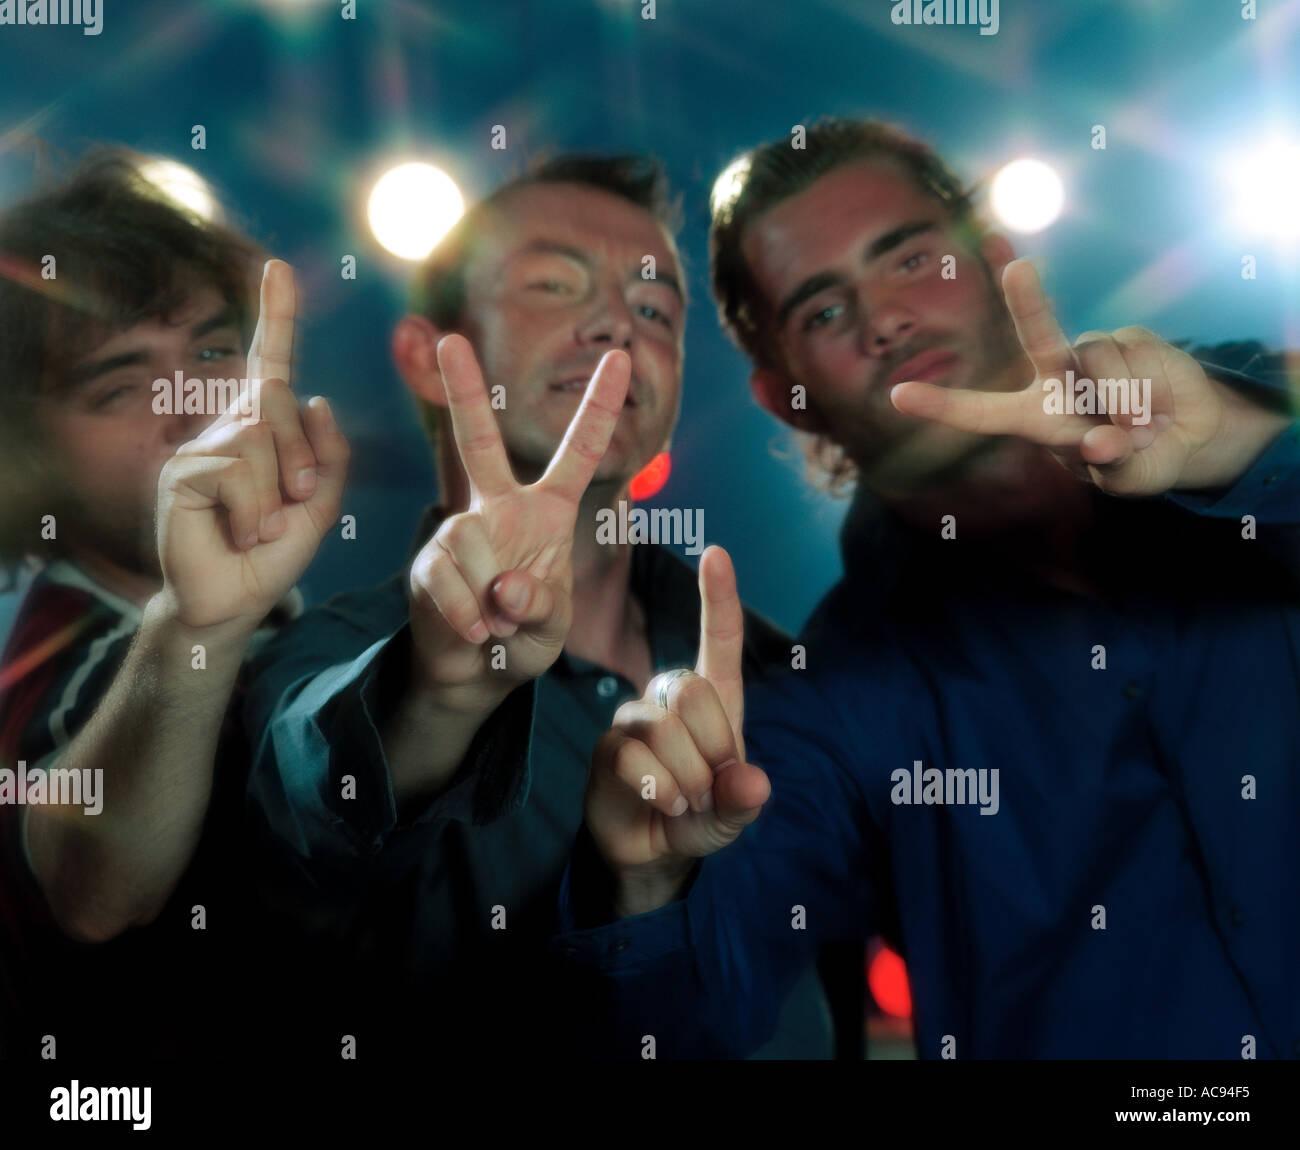 three males gesturing - Stock Image